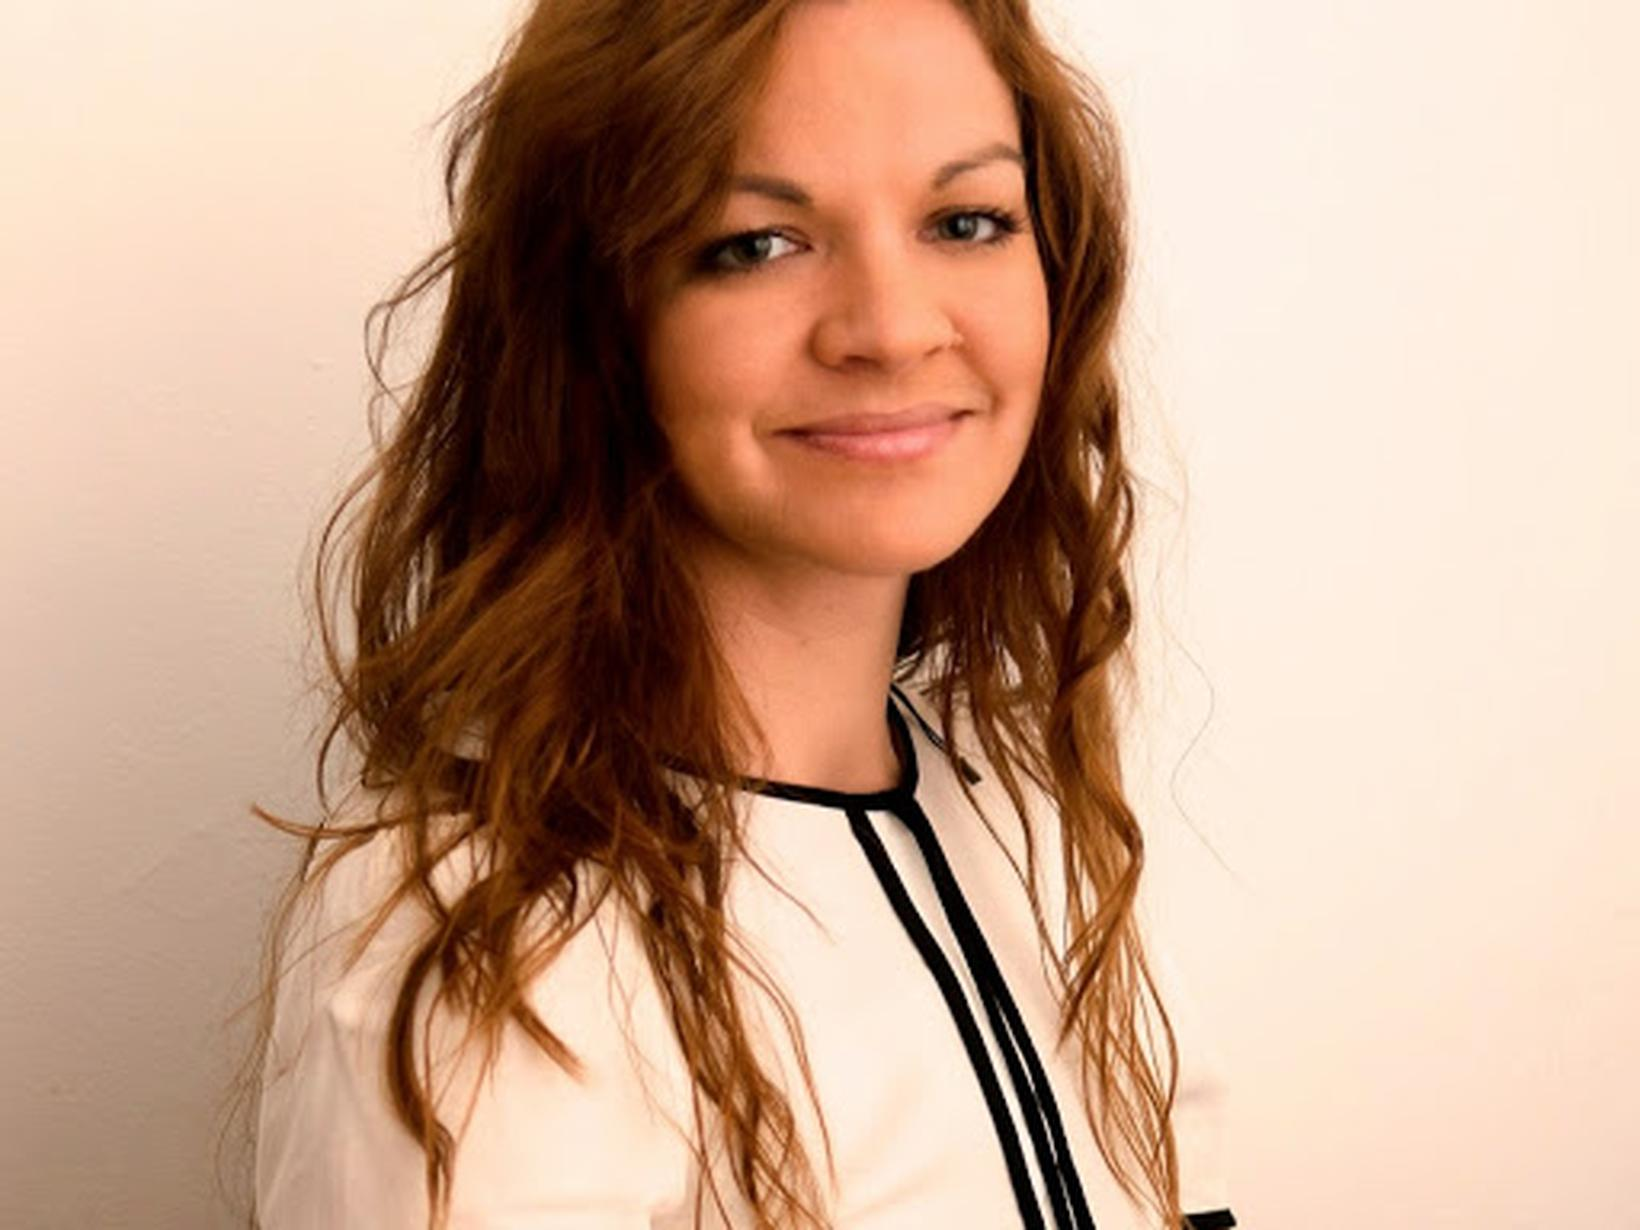 Elisha from London, United Kingdom